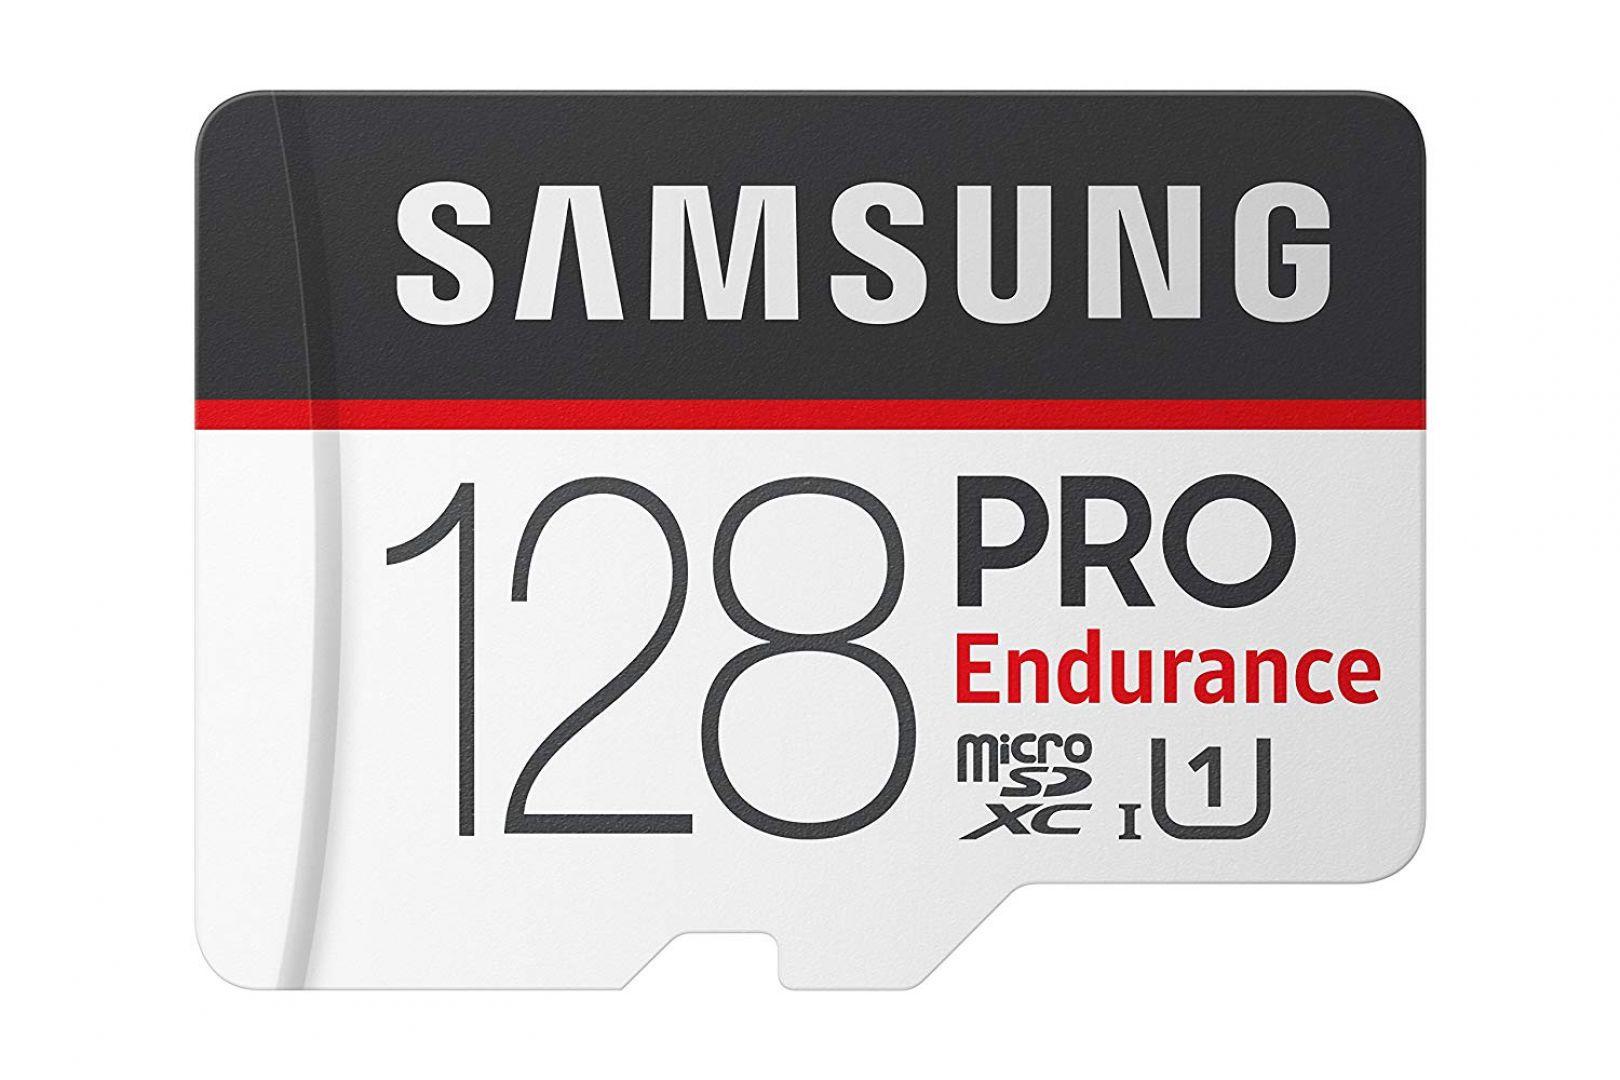 Samsung MB-MJ128GA/AM product image.